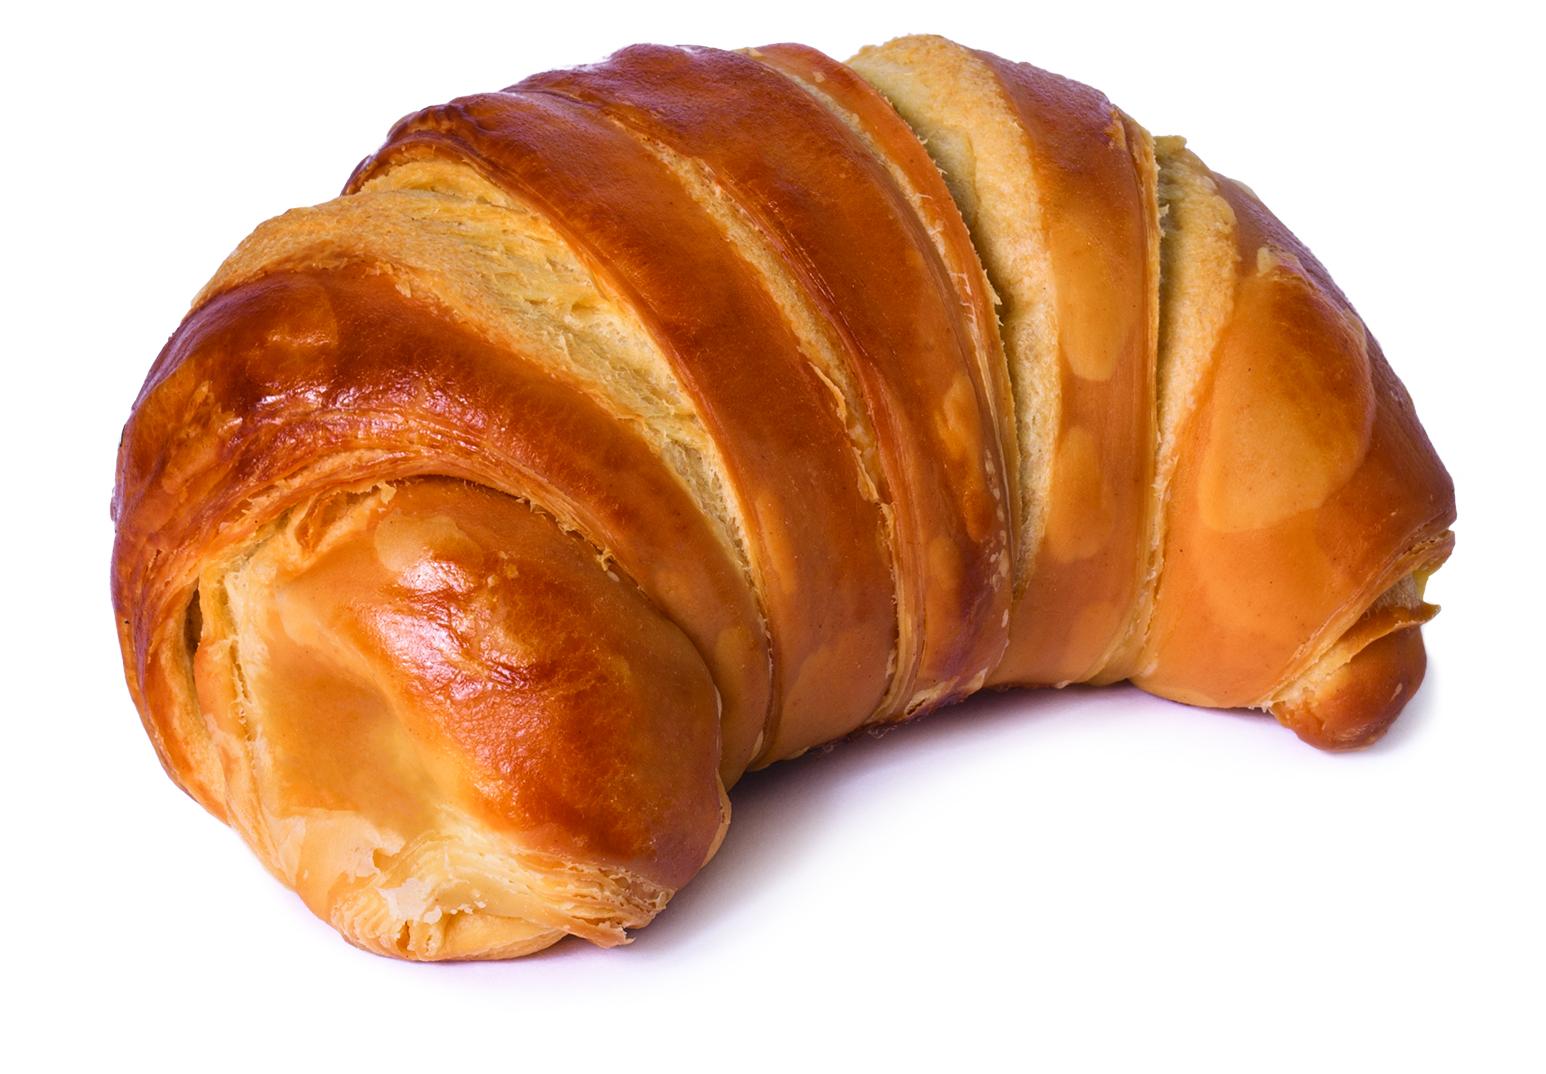 Lanche - Croissants Croissants - Goiabada